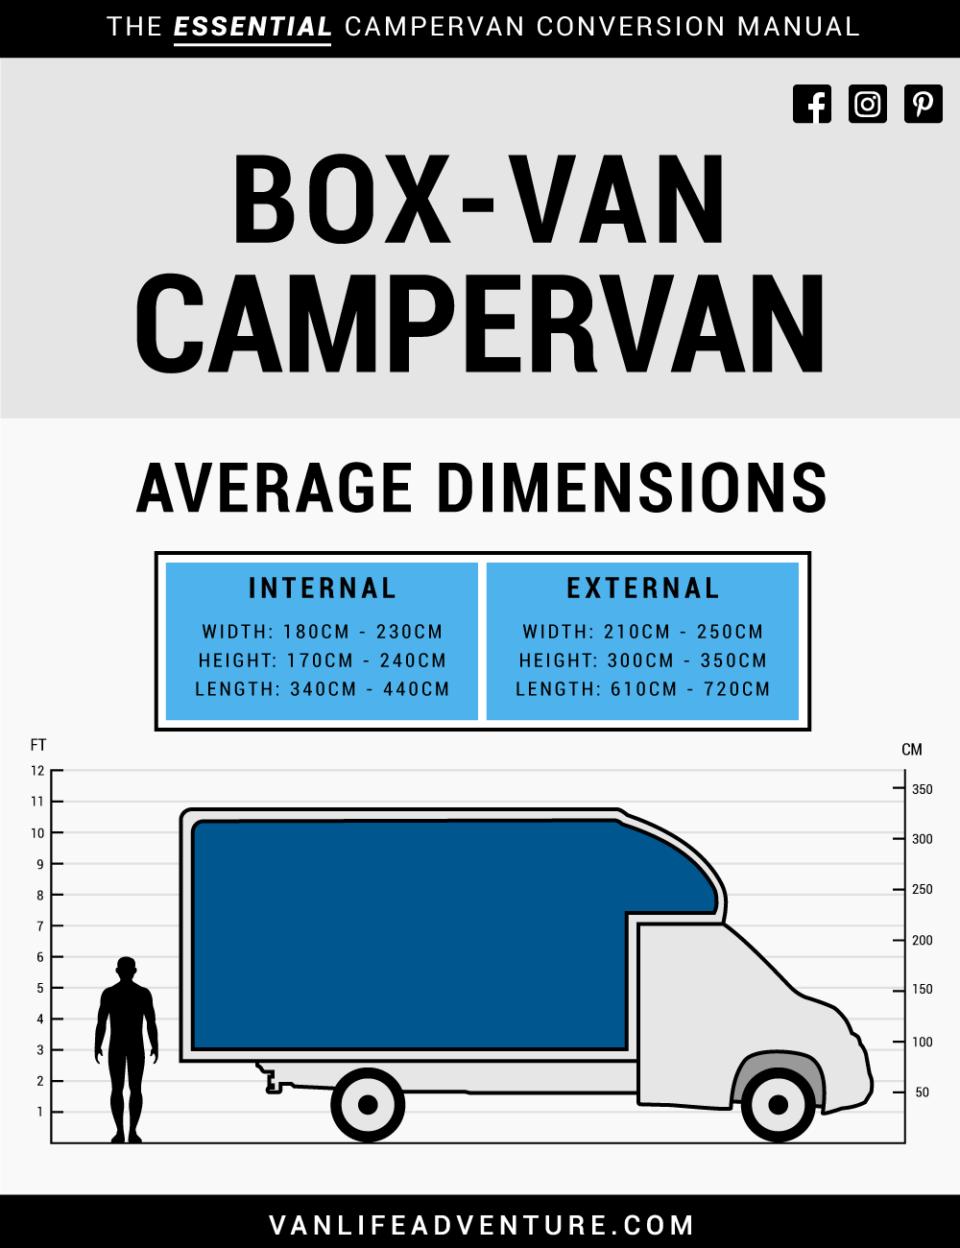 Box-Van Campervan Dimensions